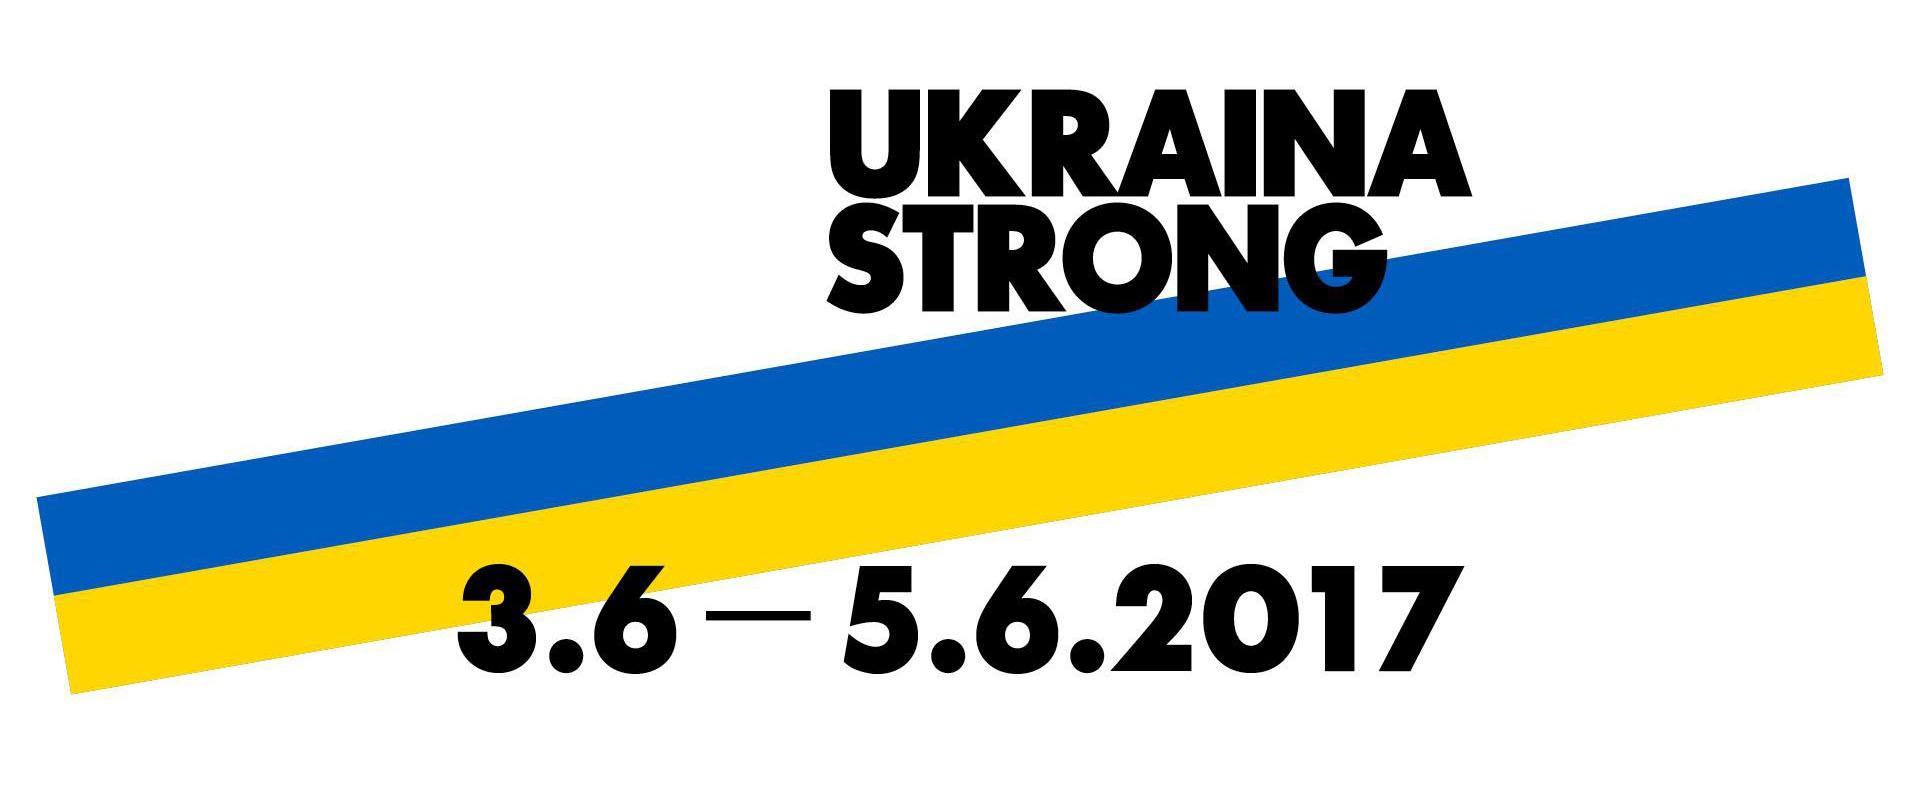 ukrainastrong_ohne